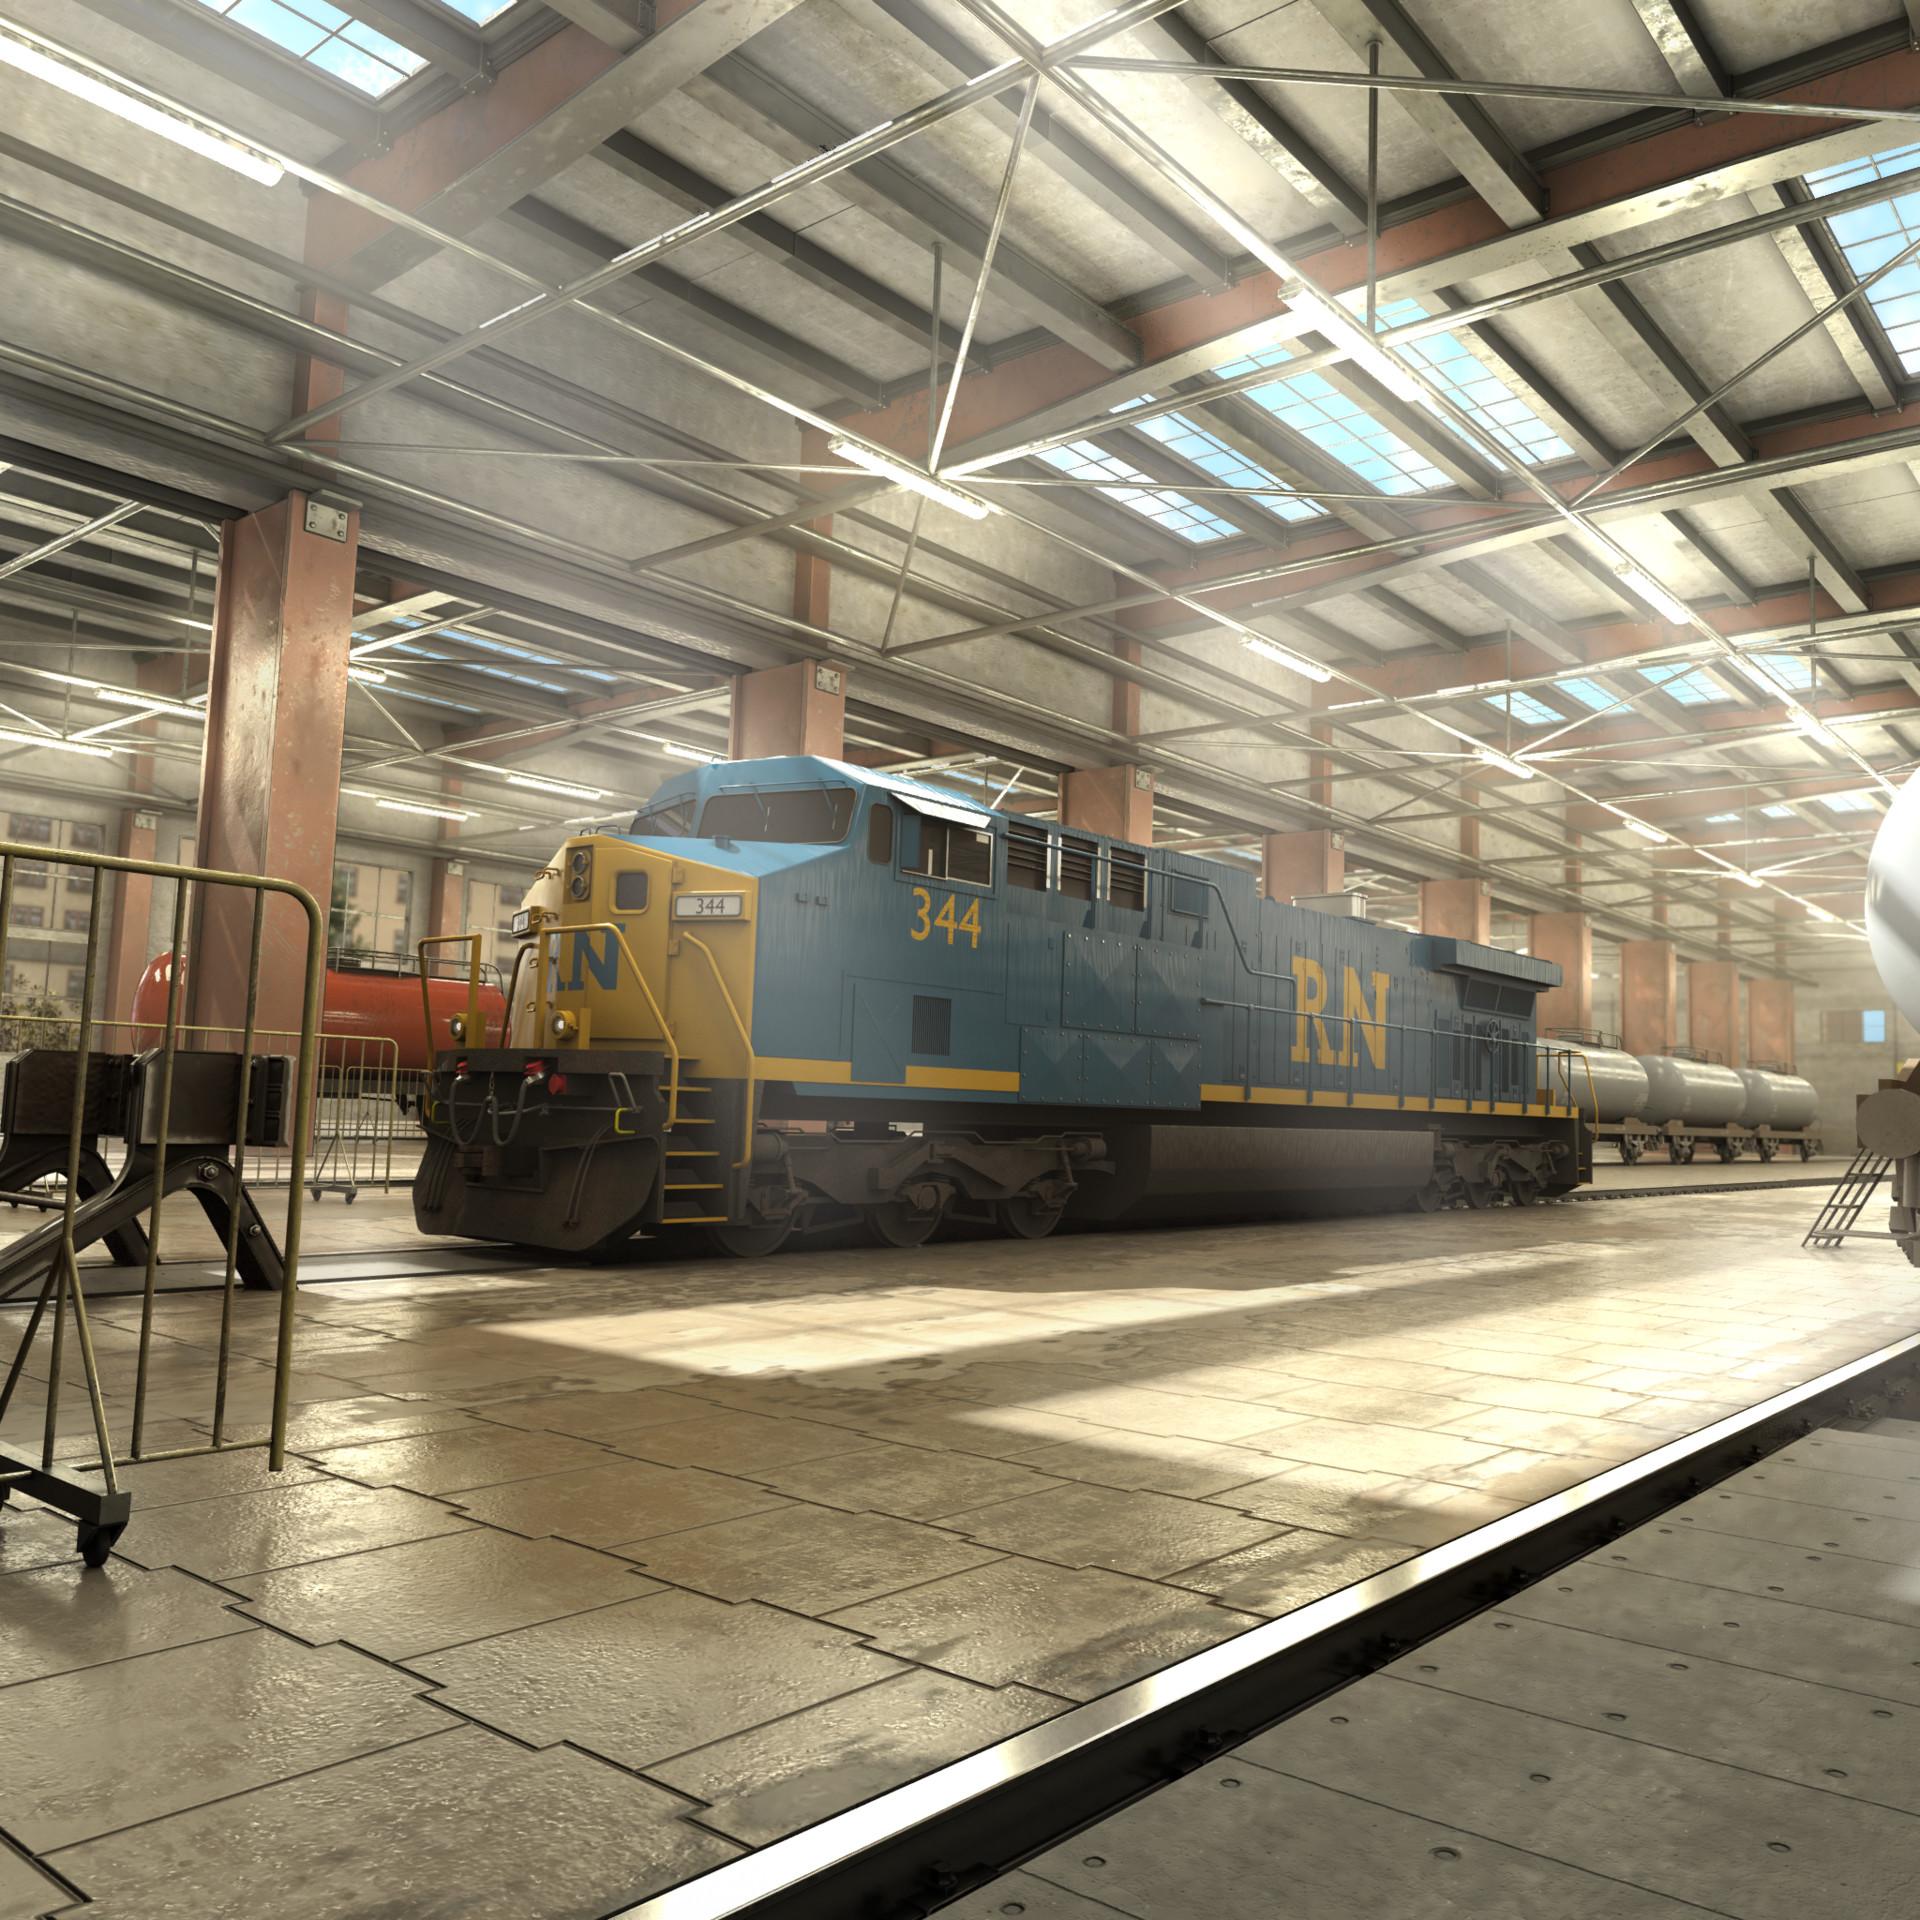 ArtStation - Railnation Trainbuyscreen Project, Maximilian